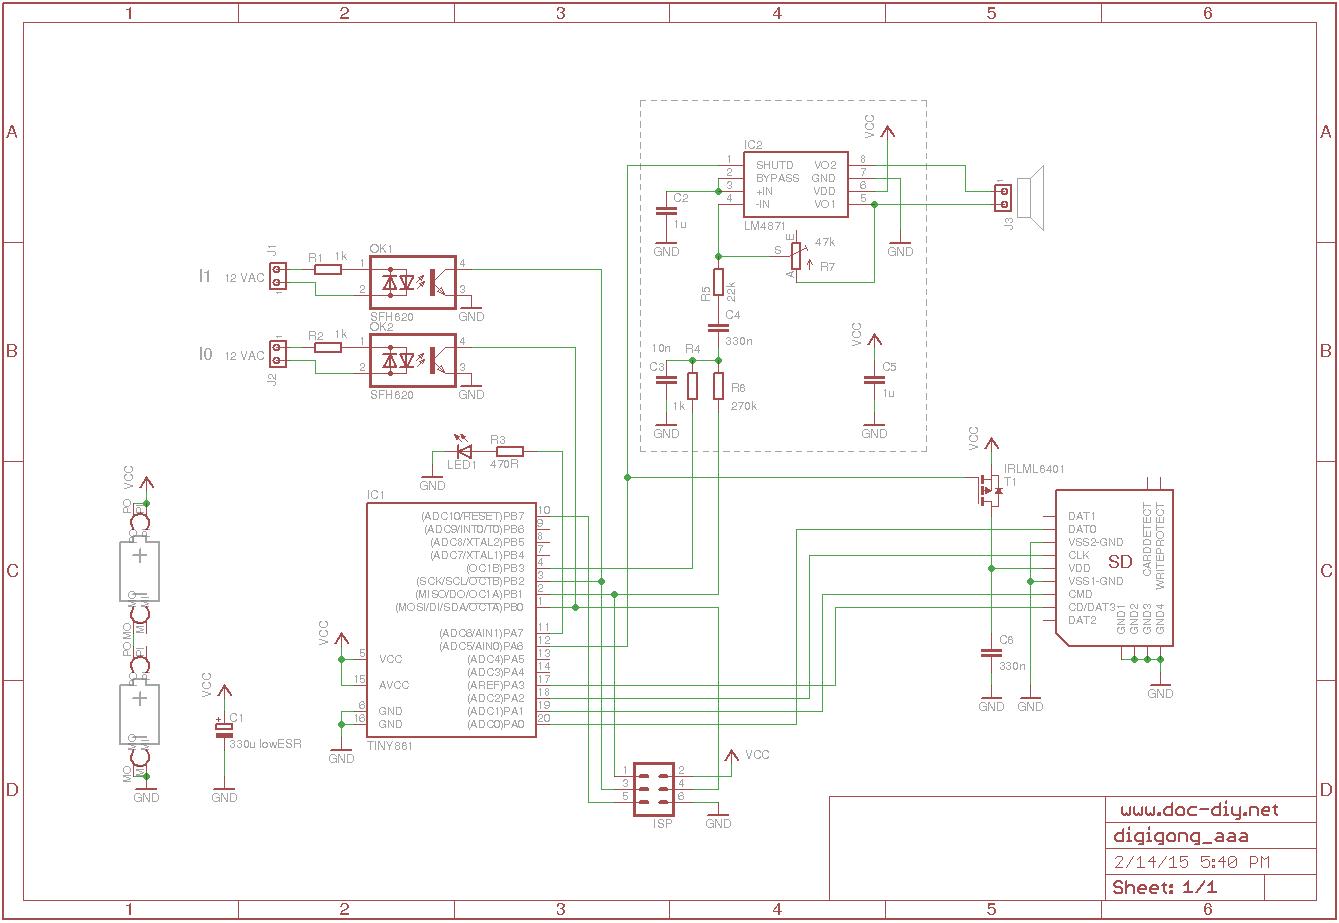 Digigong The Digital Door Bell Ding Dong Circuit Schematics